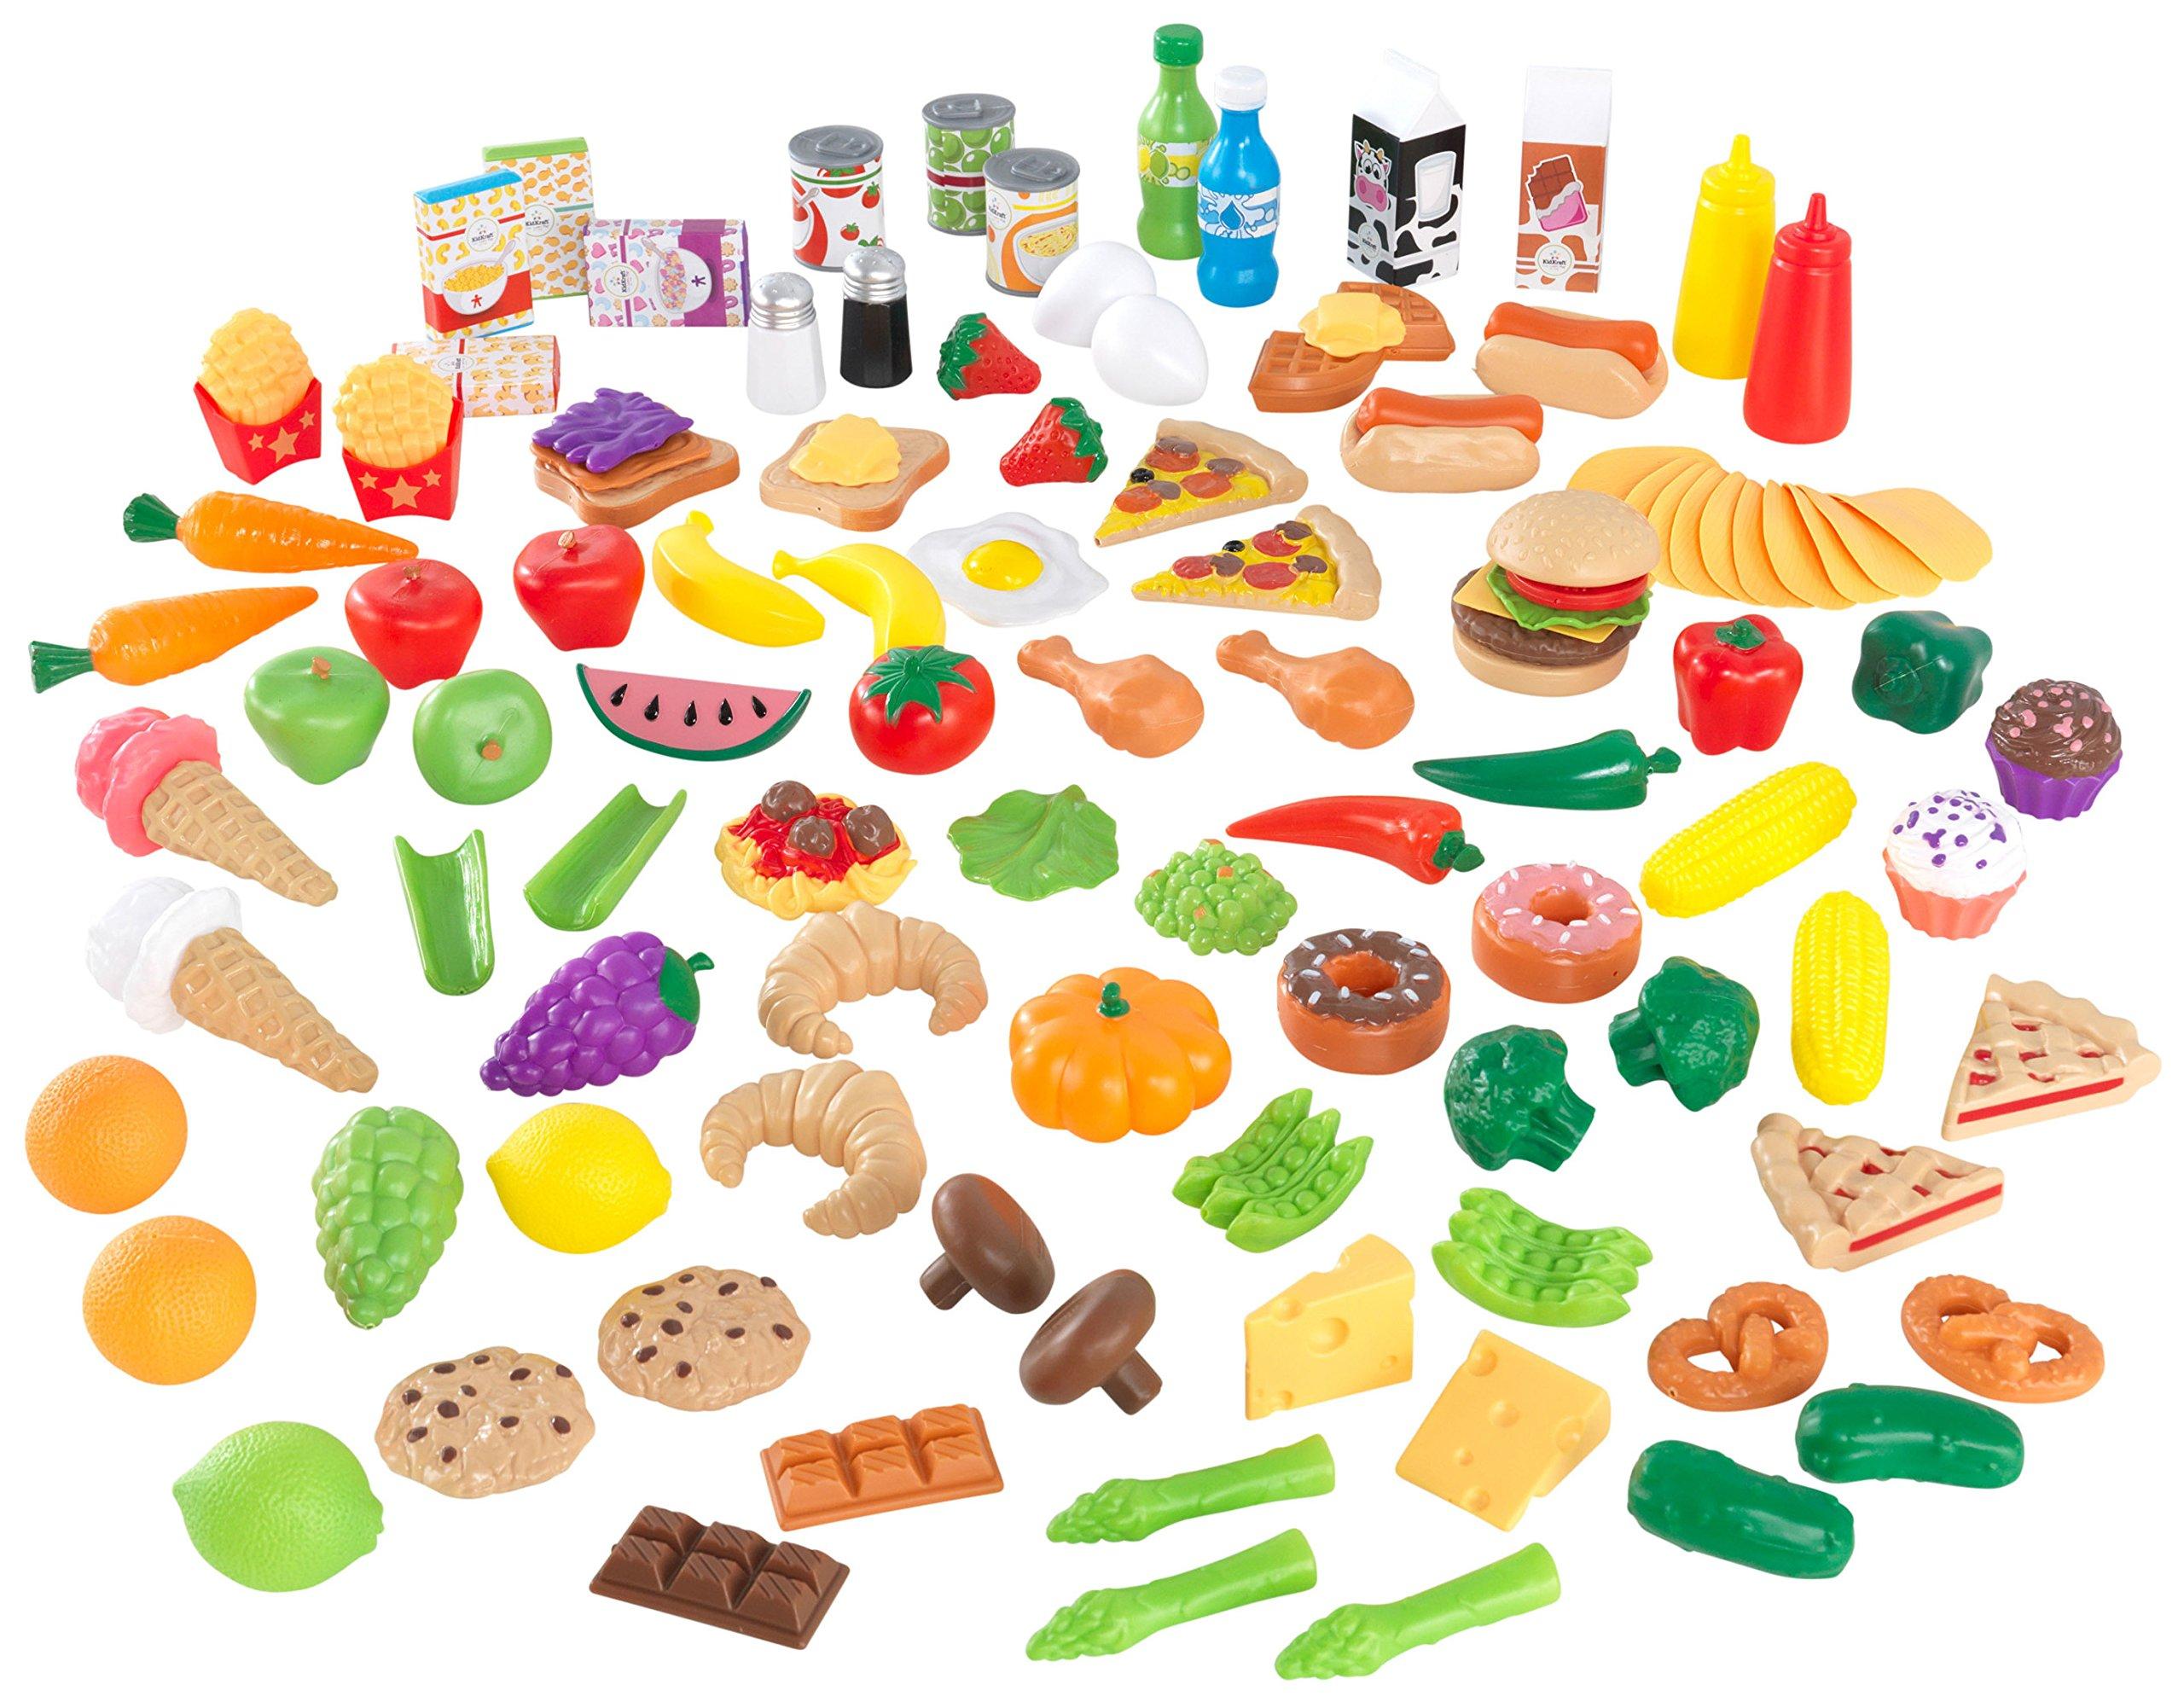 KidKraft Tasty Treats Play Food Set (115 Pieces) by KidKraft